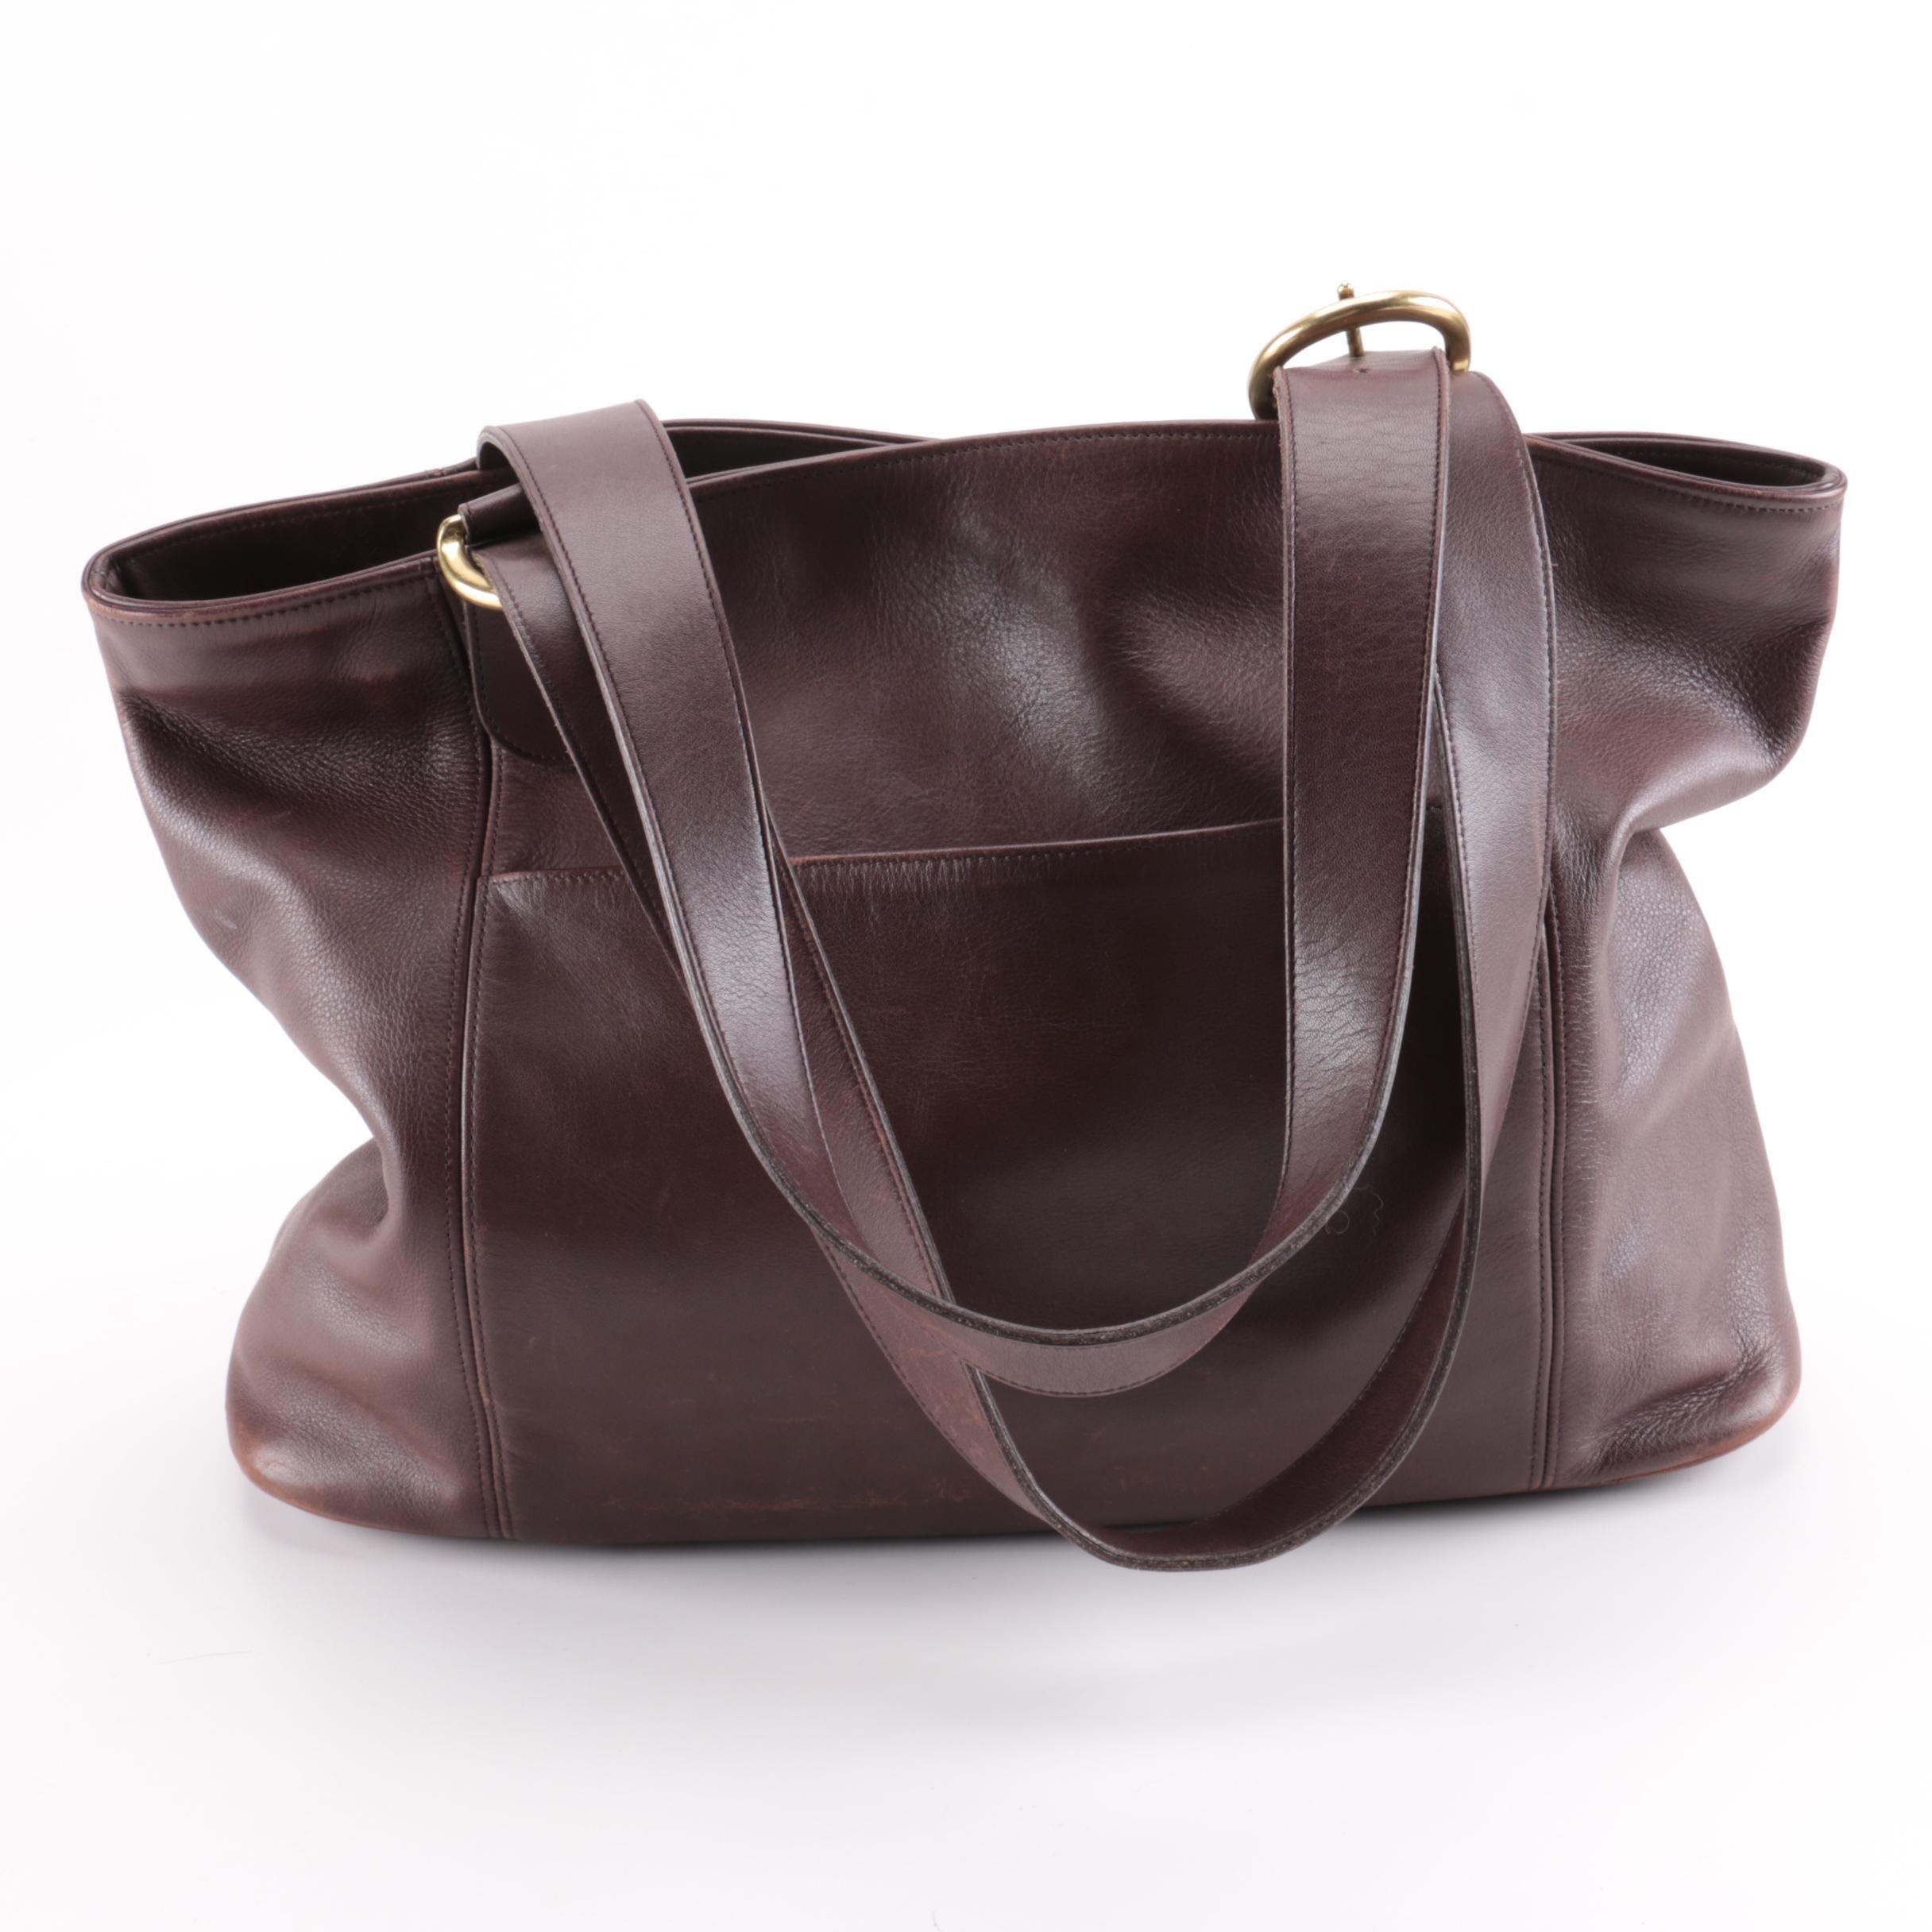 Vintage Coach Brown Leather Tote Bag